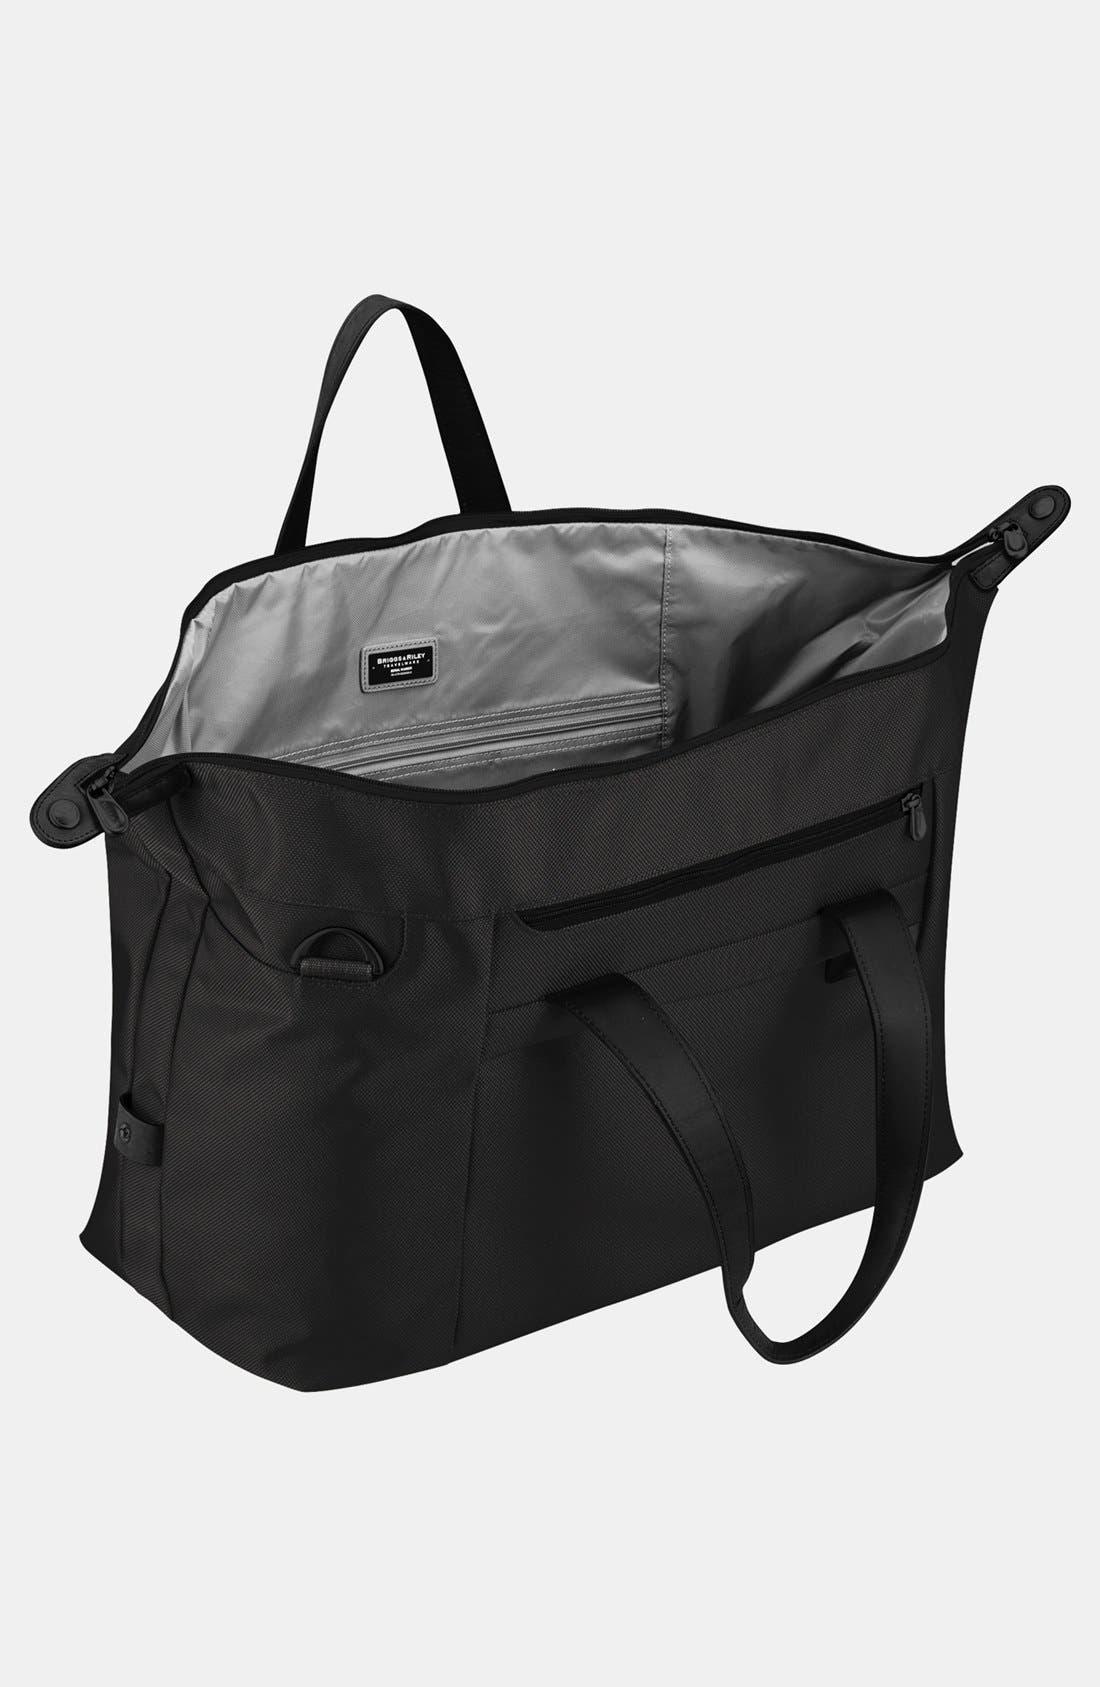 BRIGGS & RILEY,                             'Baseline' Duffel Bag,                             Alternate thumbnail 7, color,                             BLACK